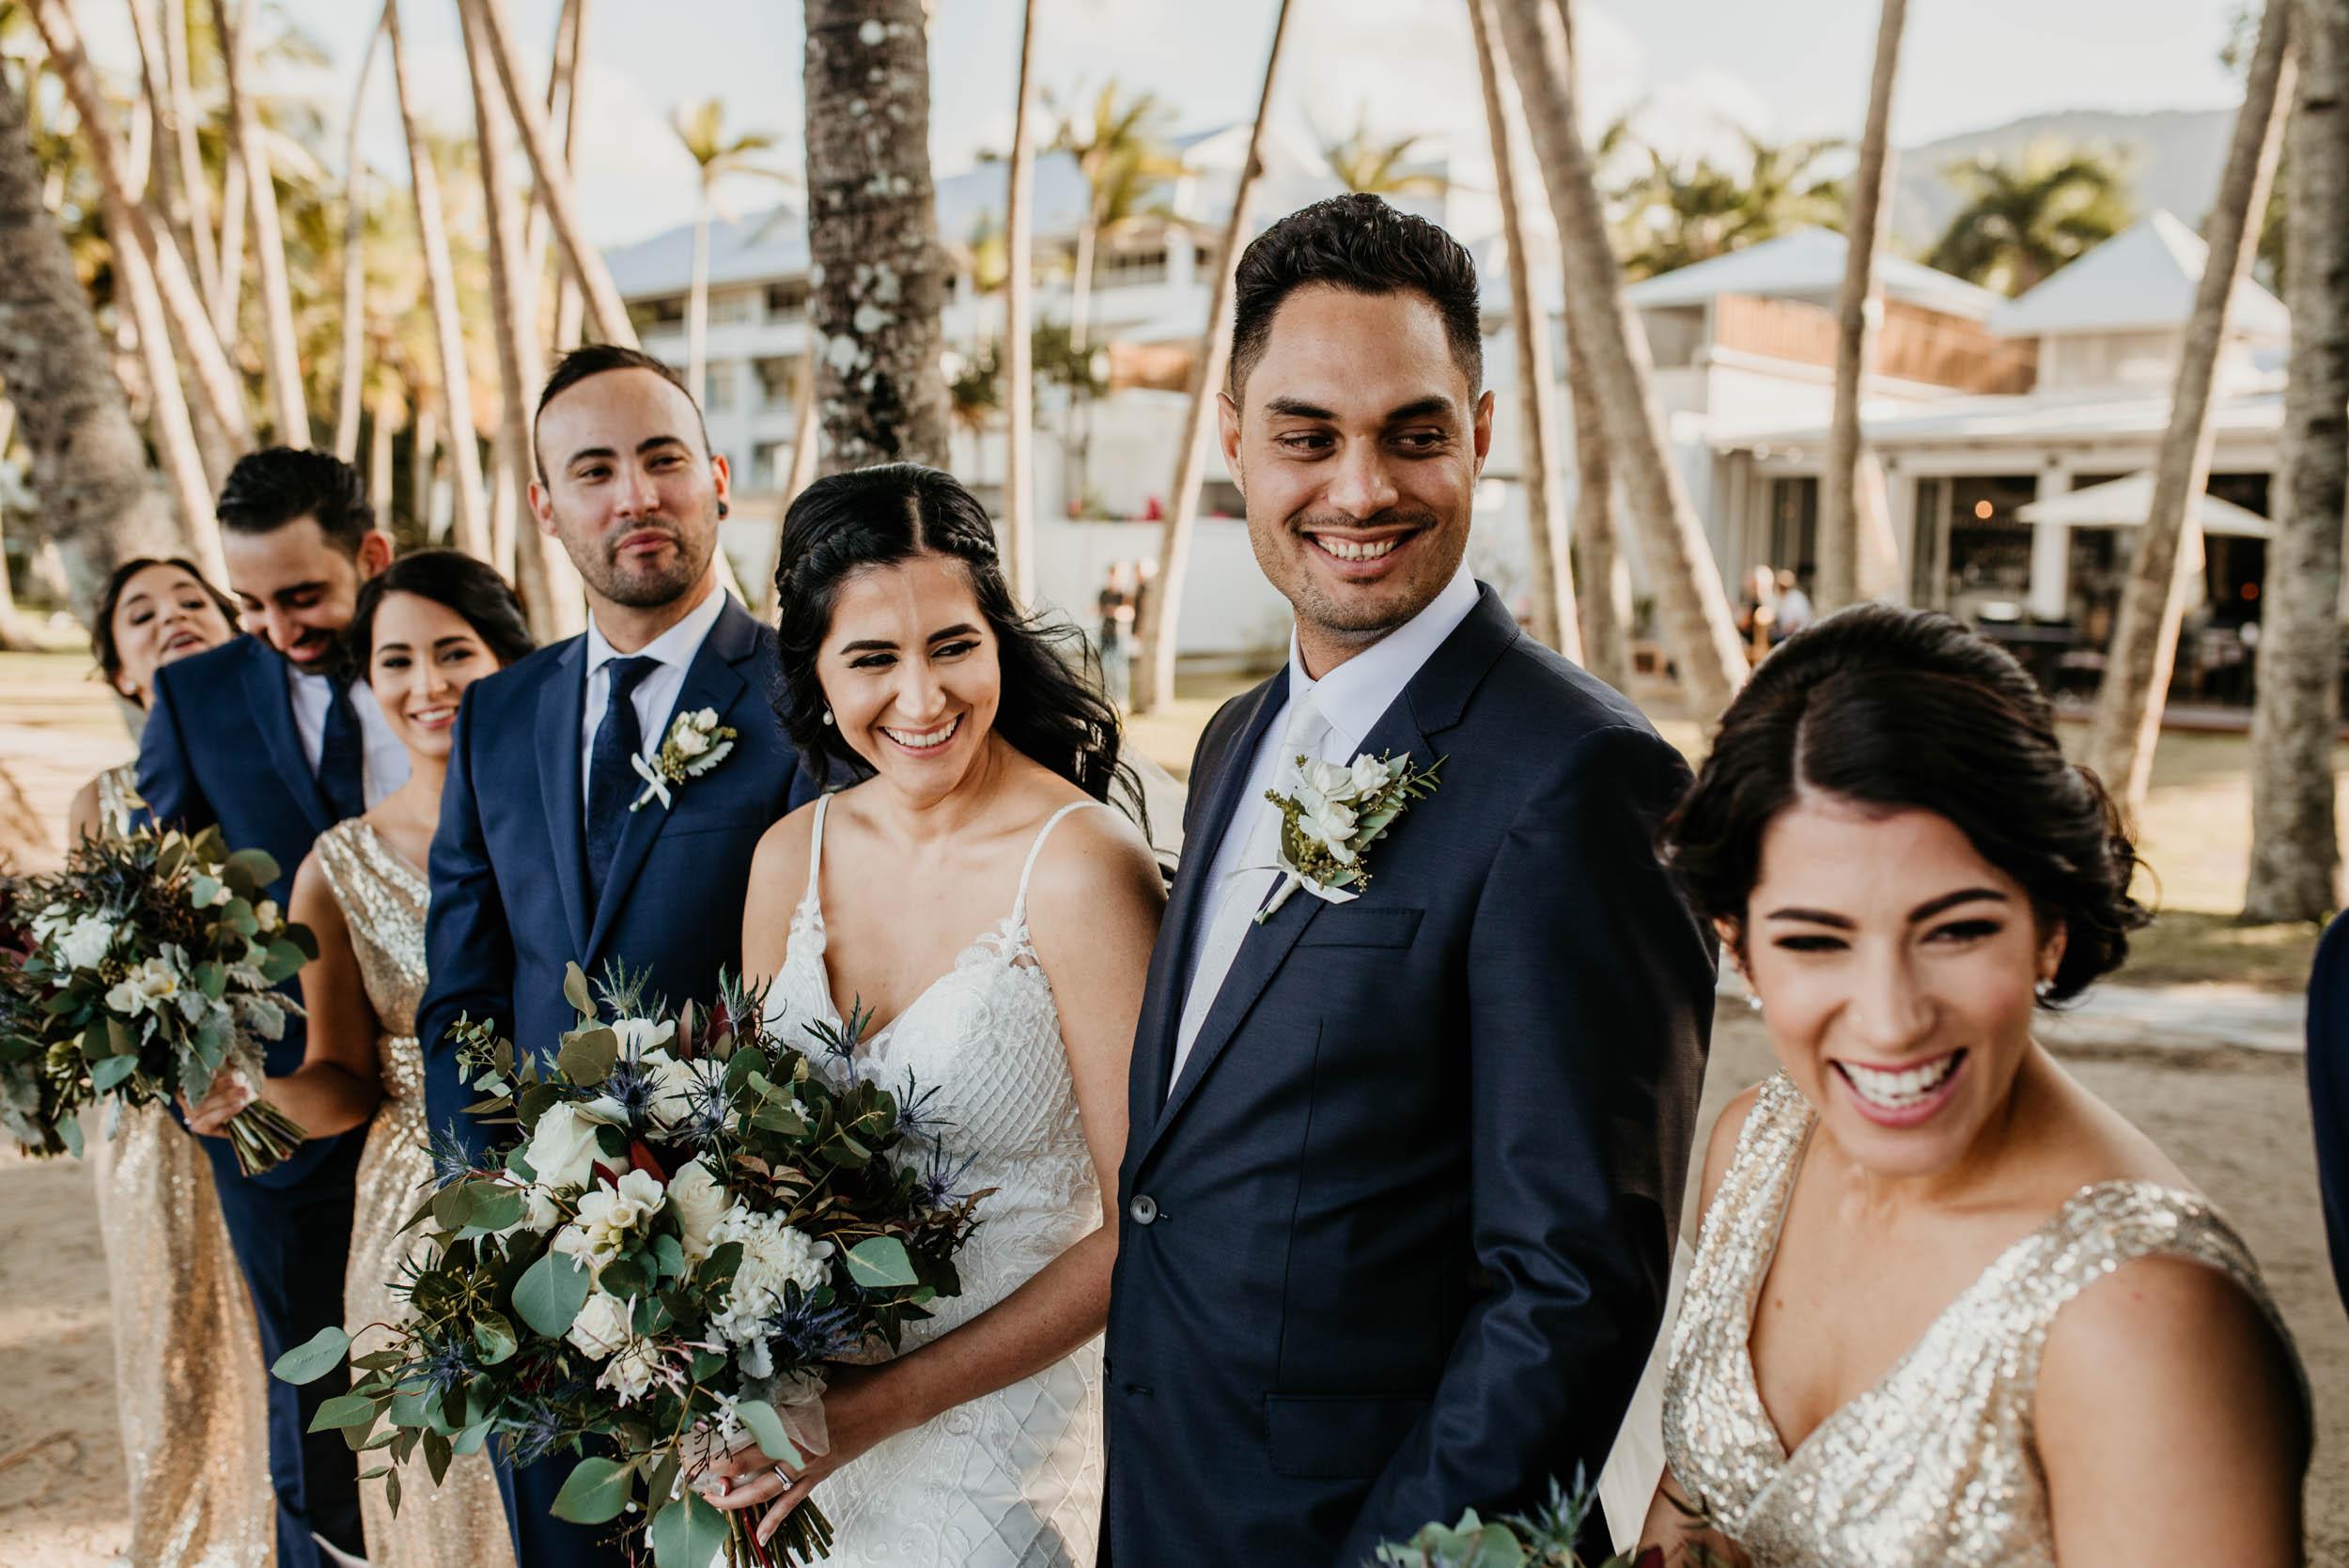 The Raw Photographer - Cairns Wedding Photographer - Beach Palm Cove Ceremony - Dress Irene Costa's Devine Bridal - Queensland-47.jpg